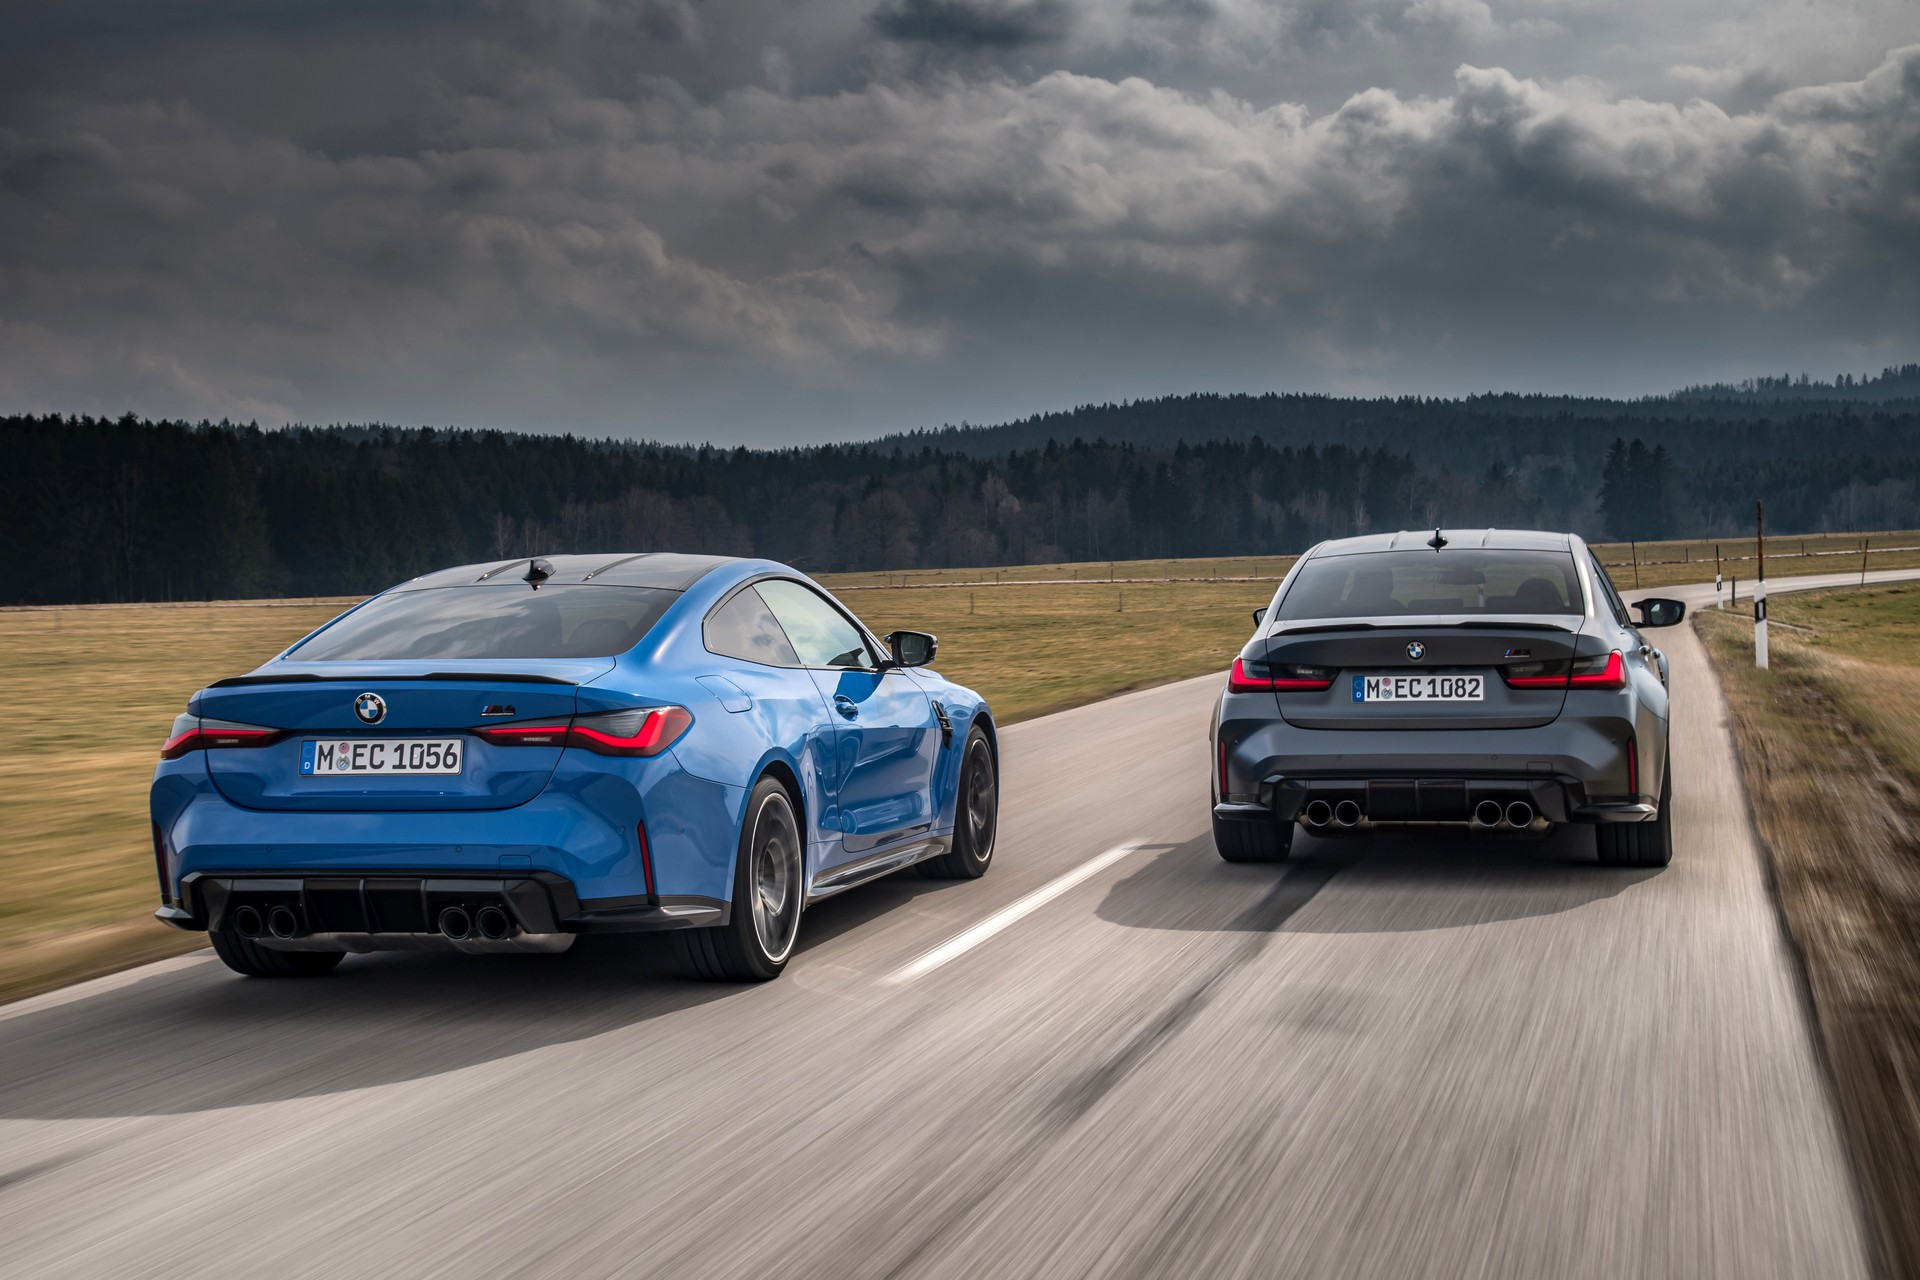 BMW-M3-M4-Competition-xDrive-9.jpg